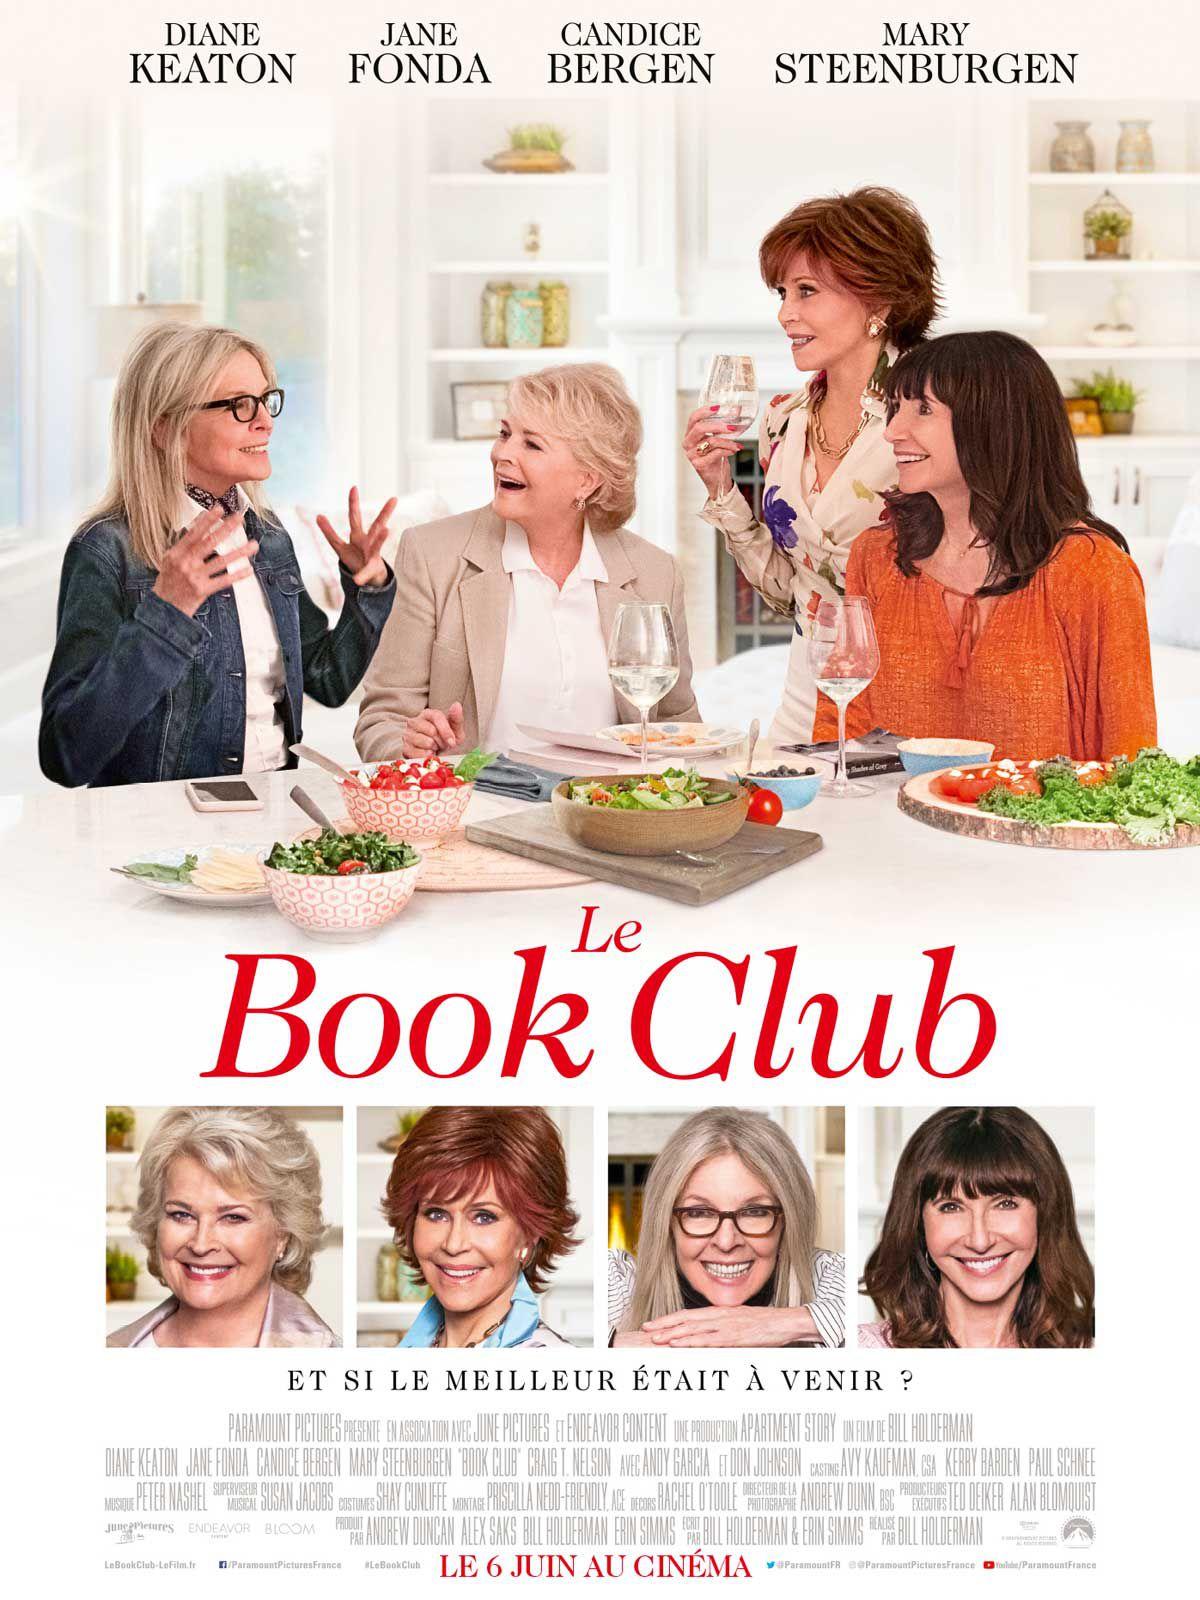 Le Book Club - Film (2018)